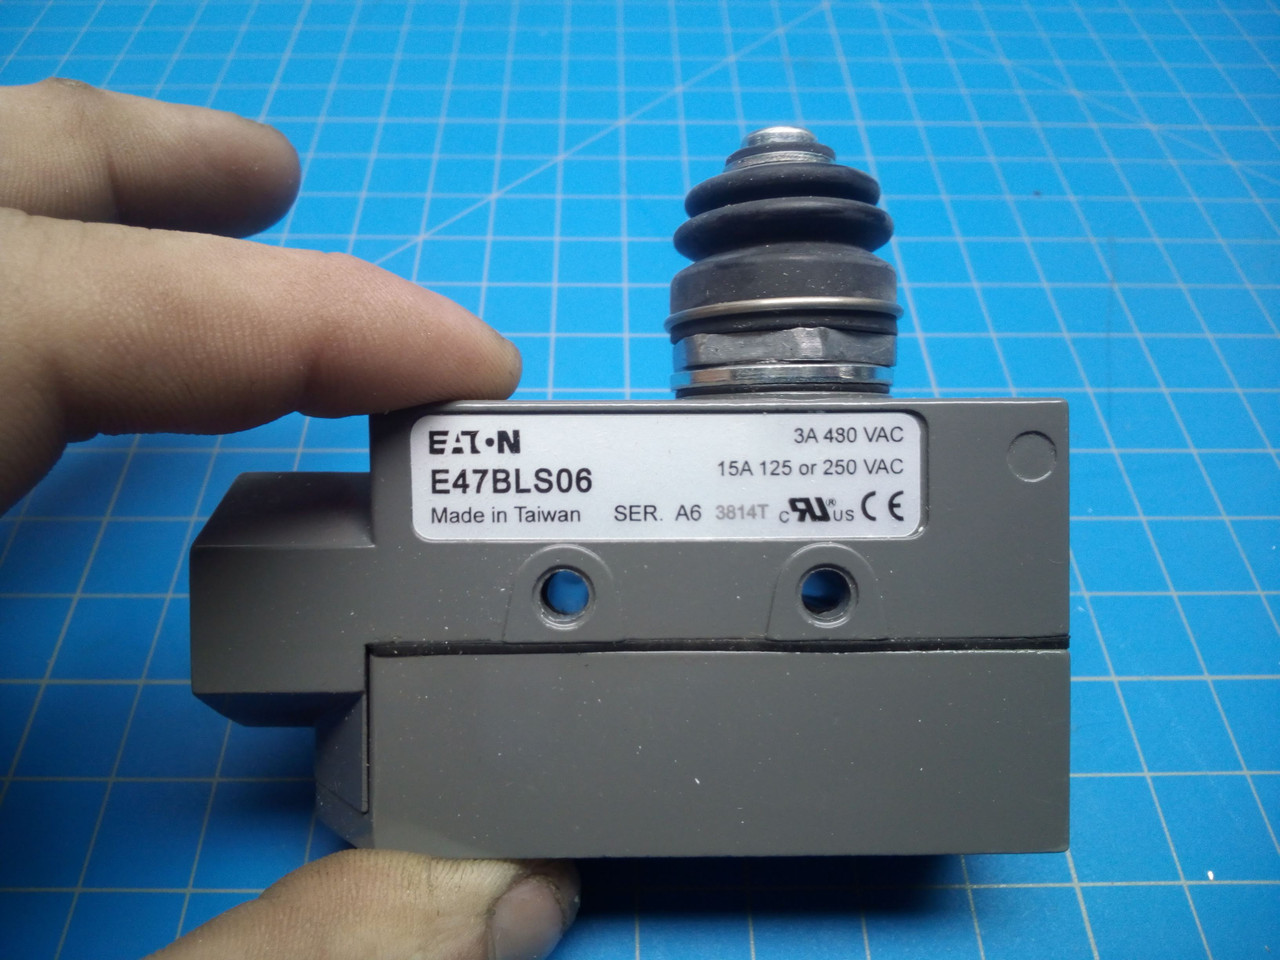 Eaton E47BLS06 Enclosed Precision Limit Switch - P01-000090